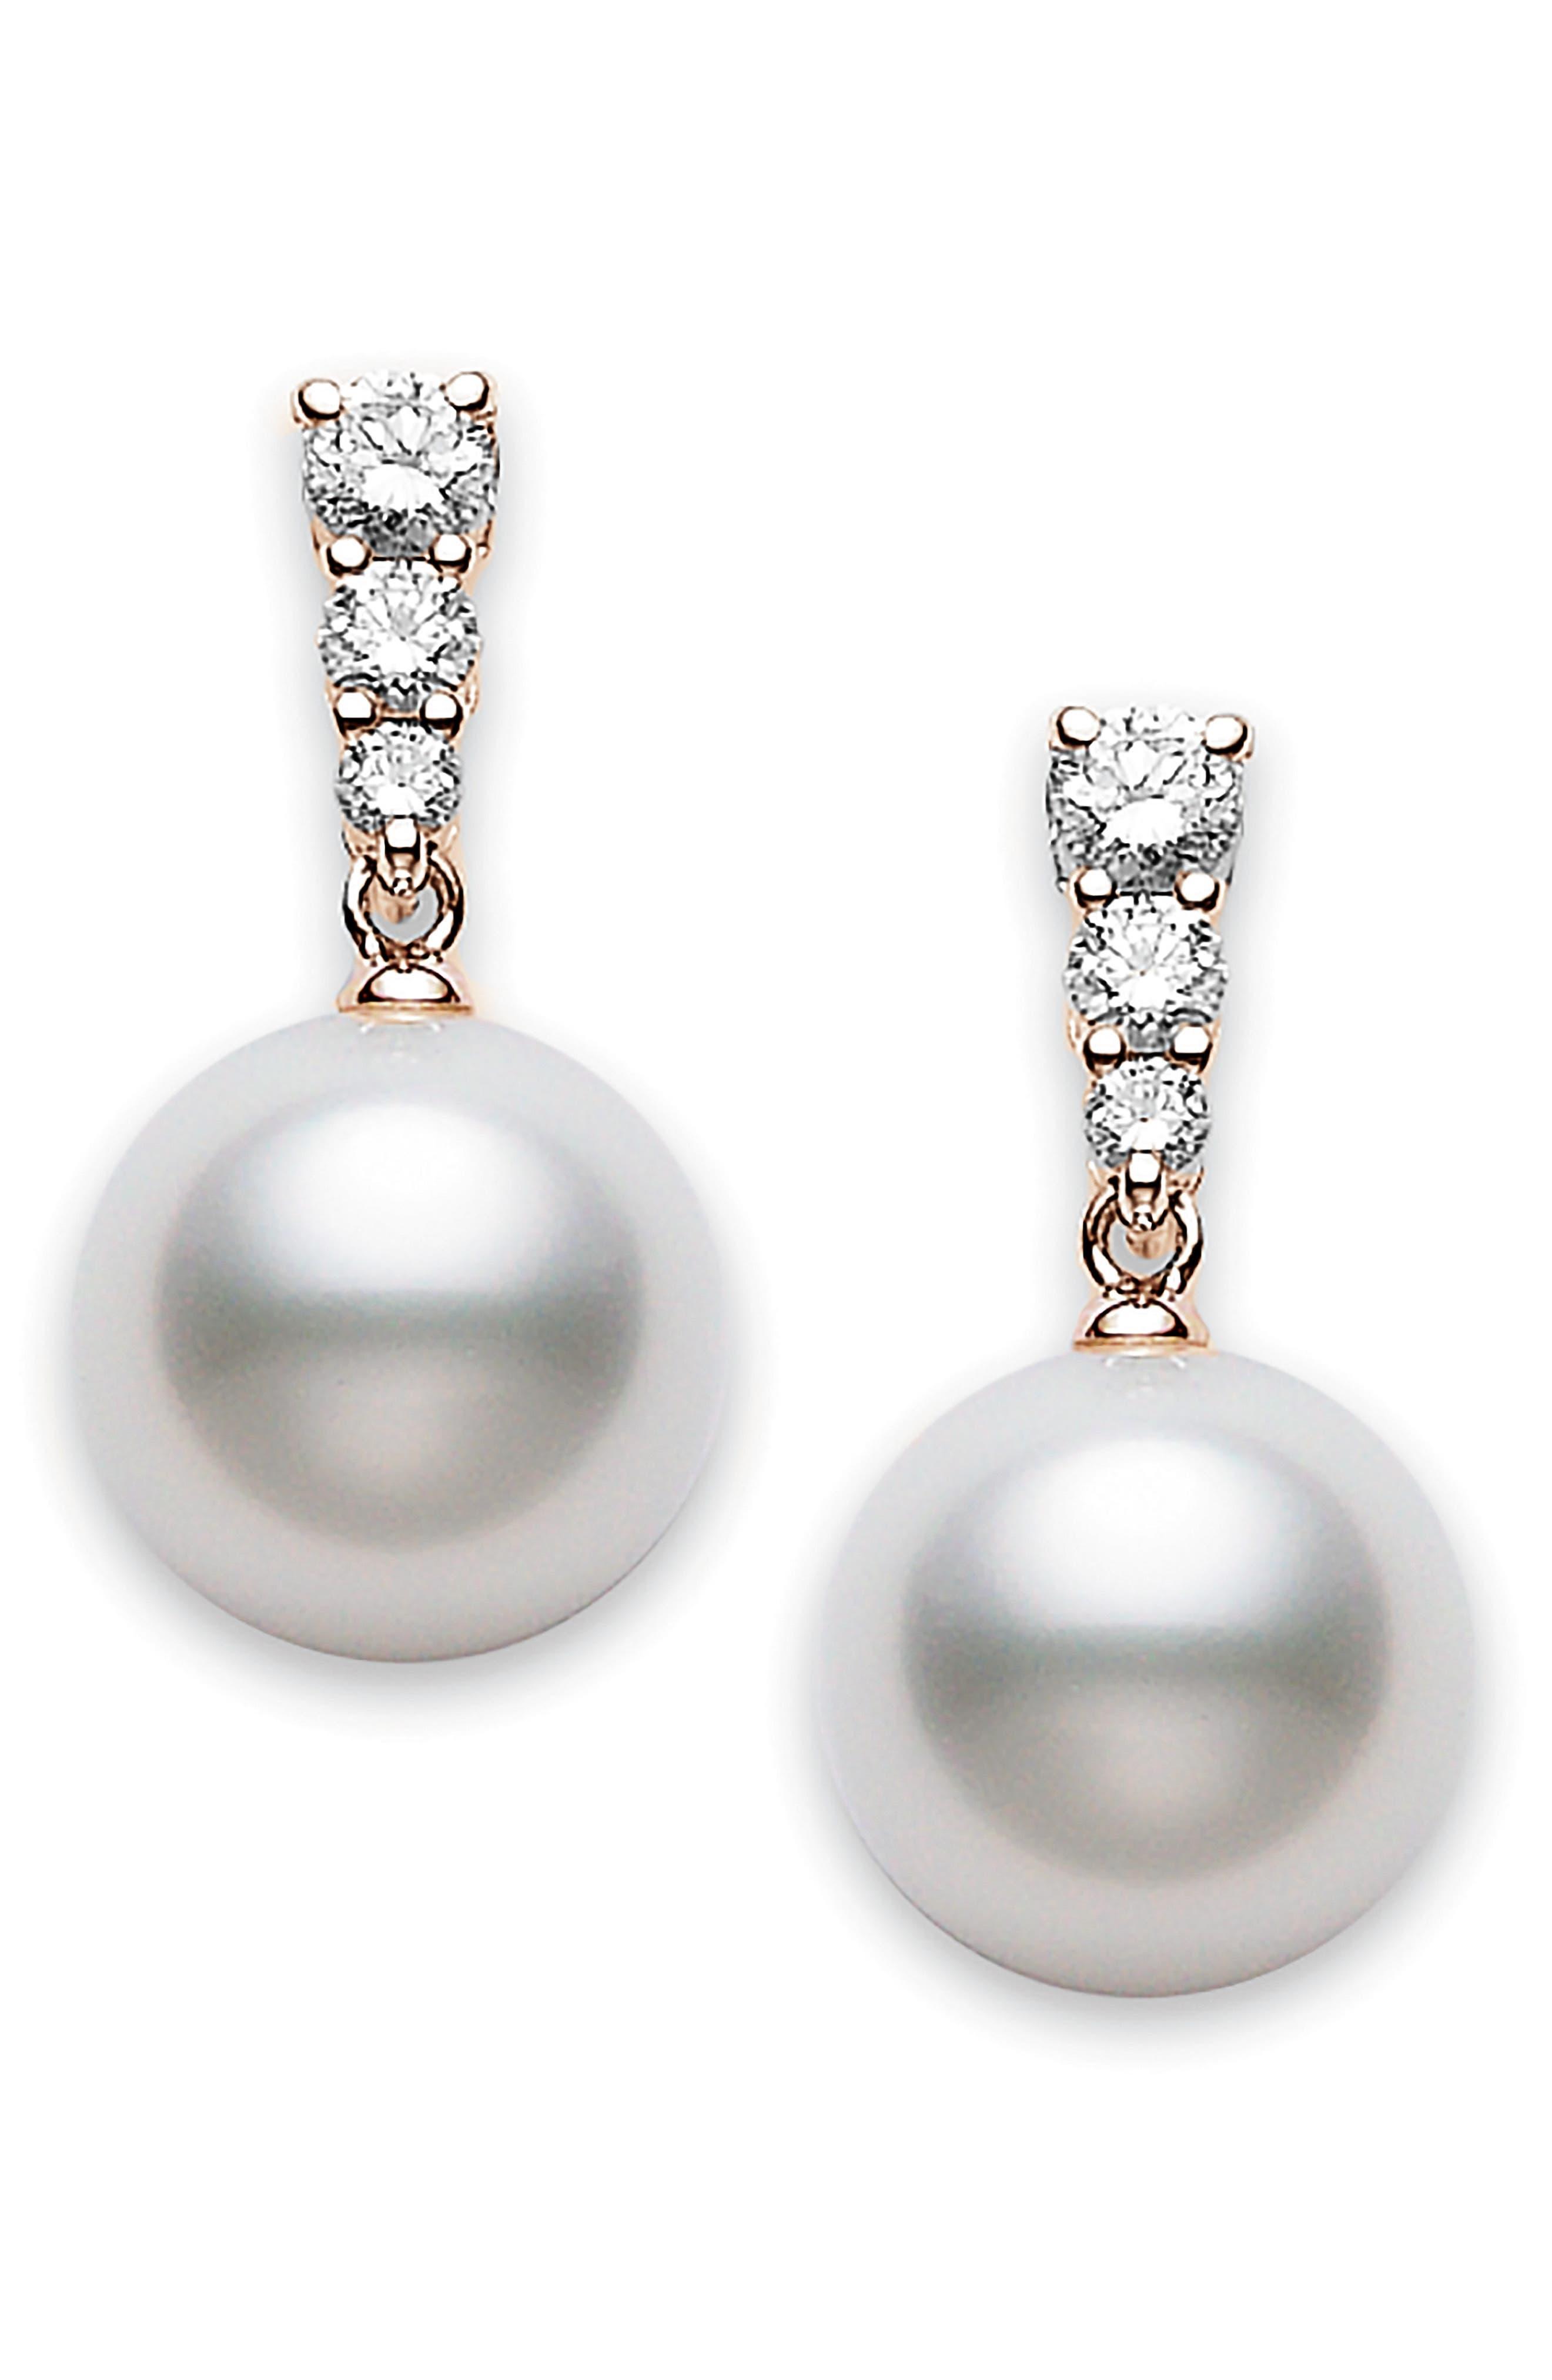 Morning Dew Diamond & Pearl Earrings